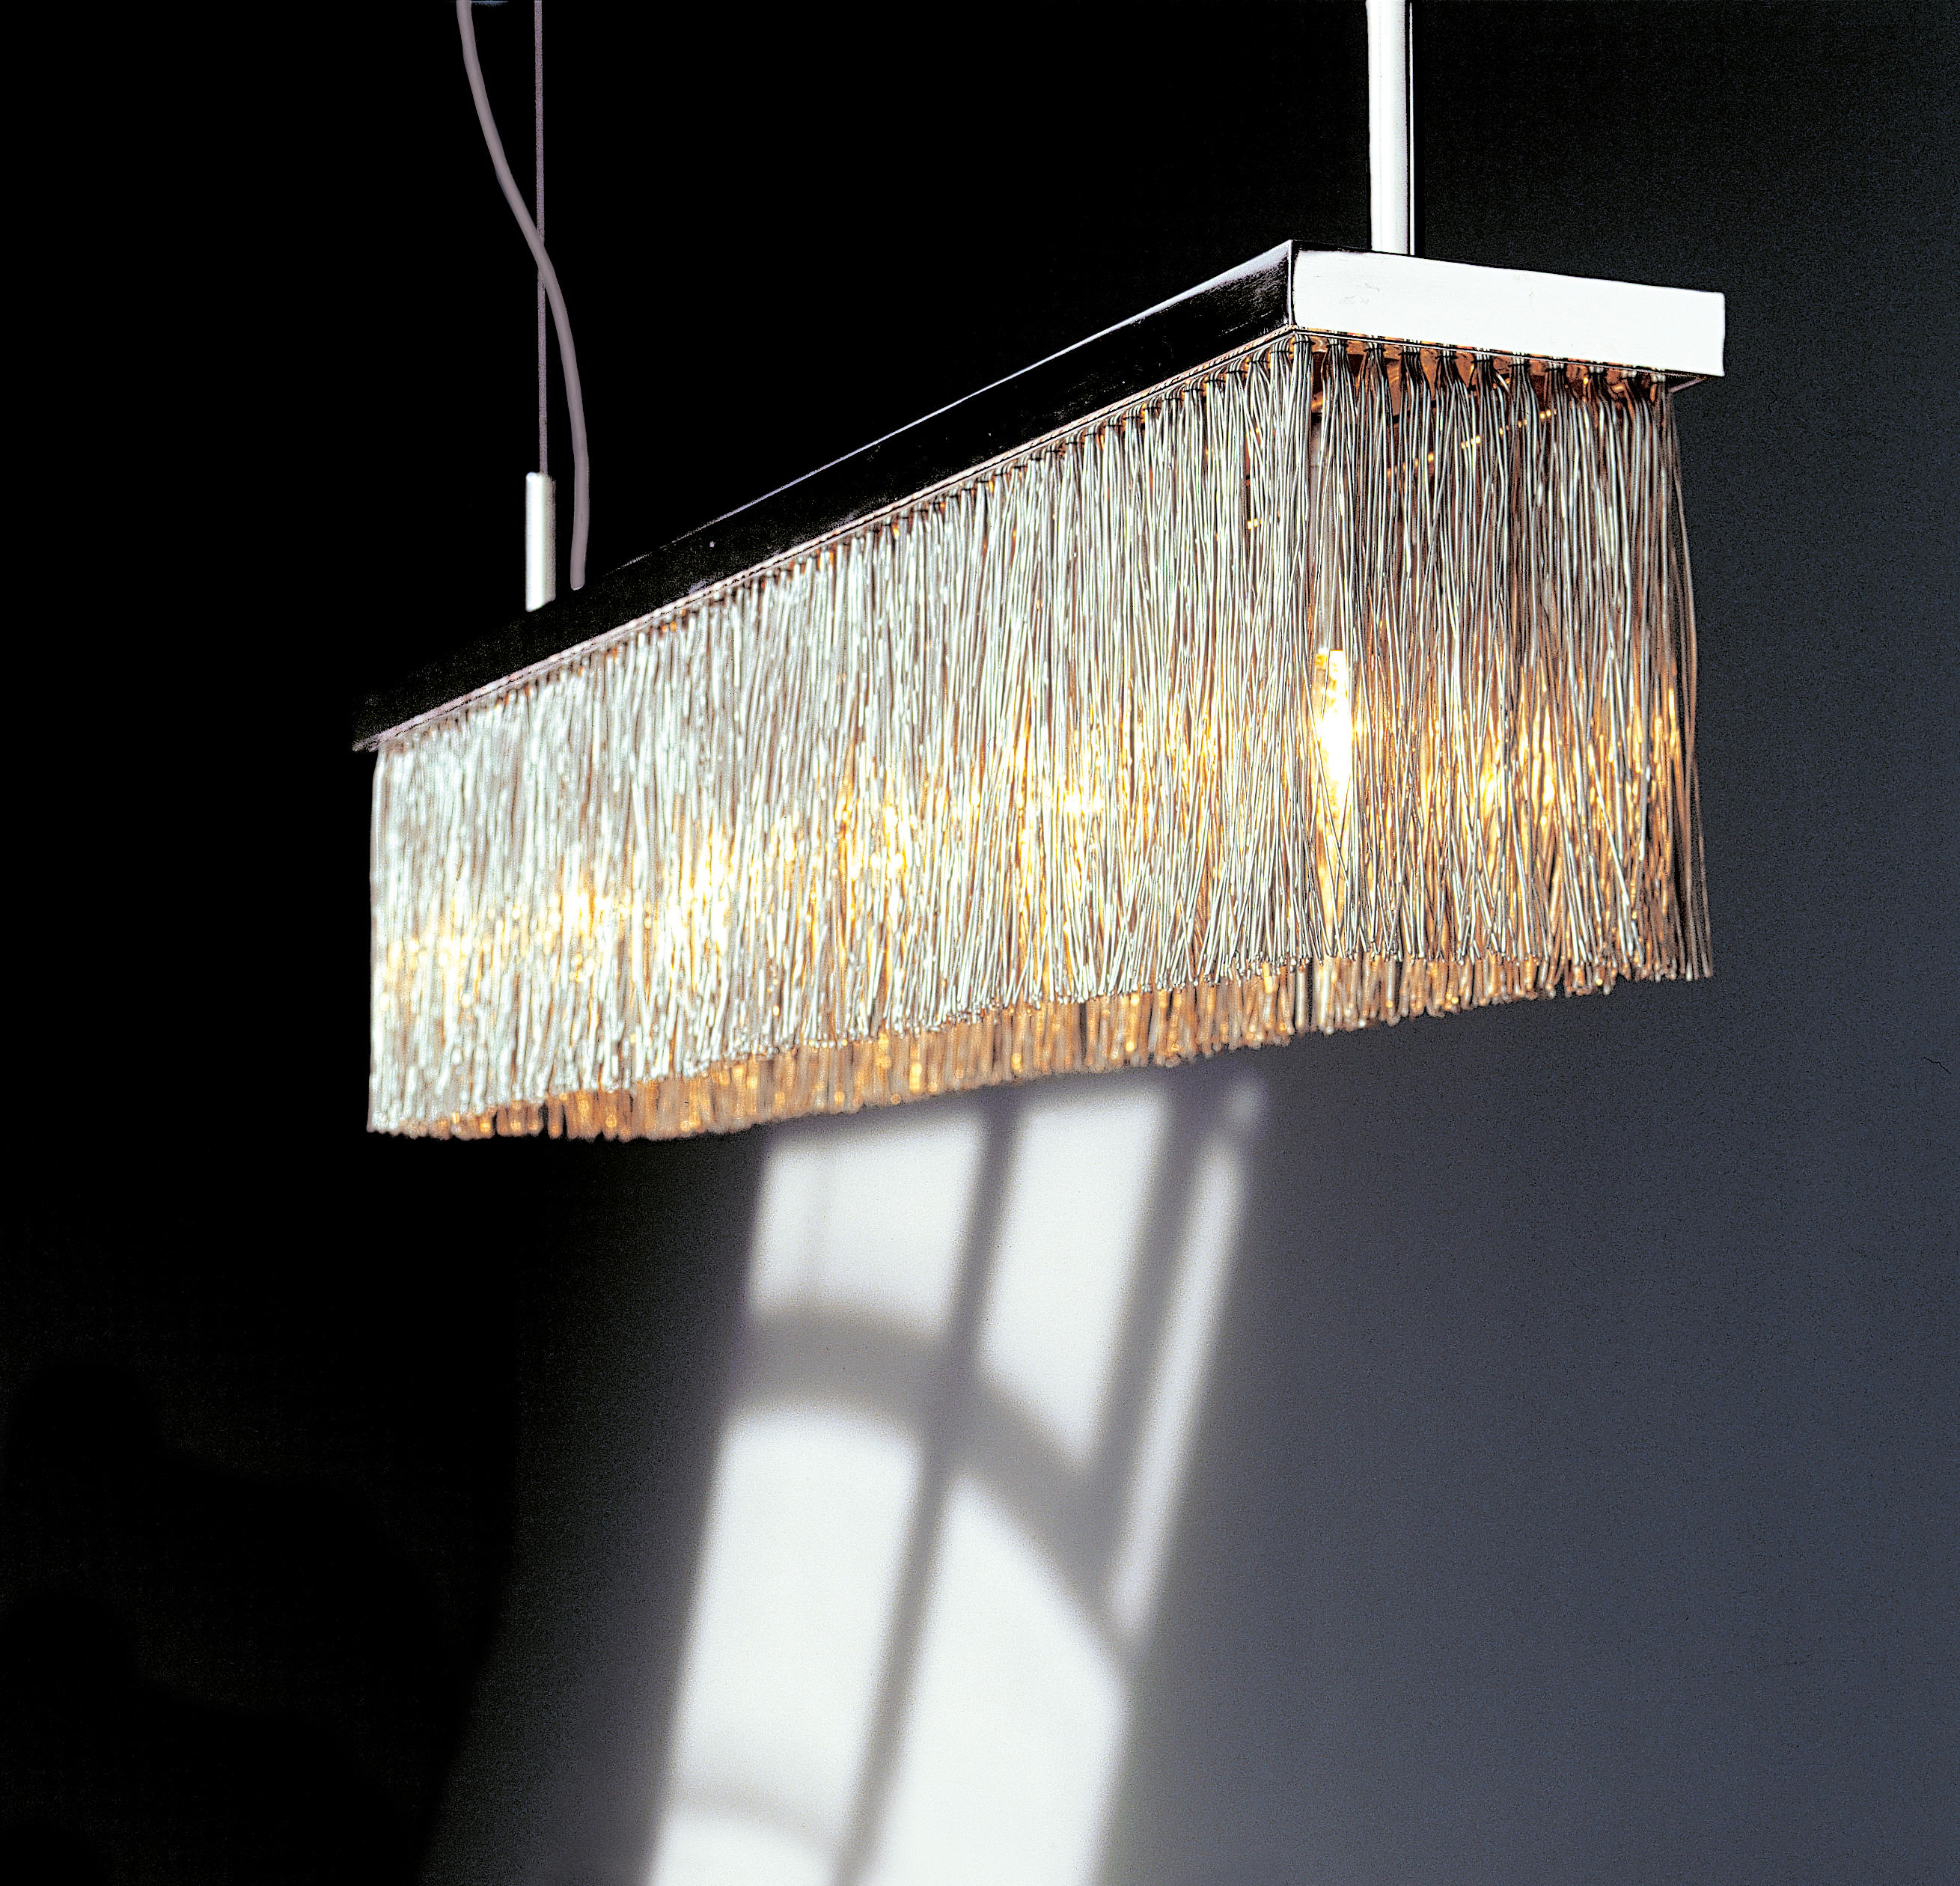 Broom Hanging Lamp Suspended Lights From Brand Van